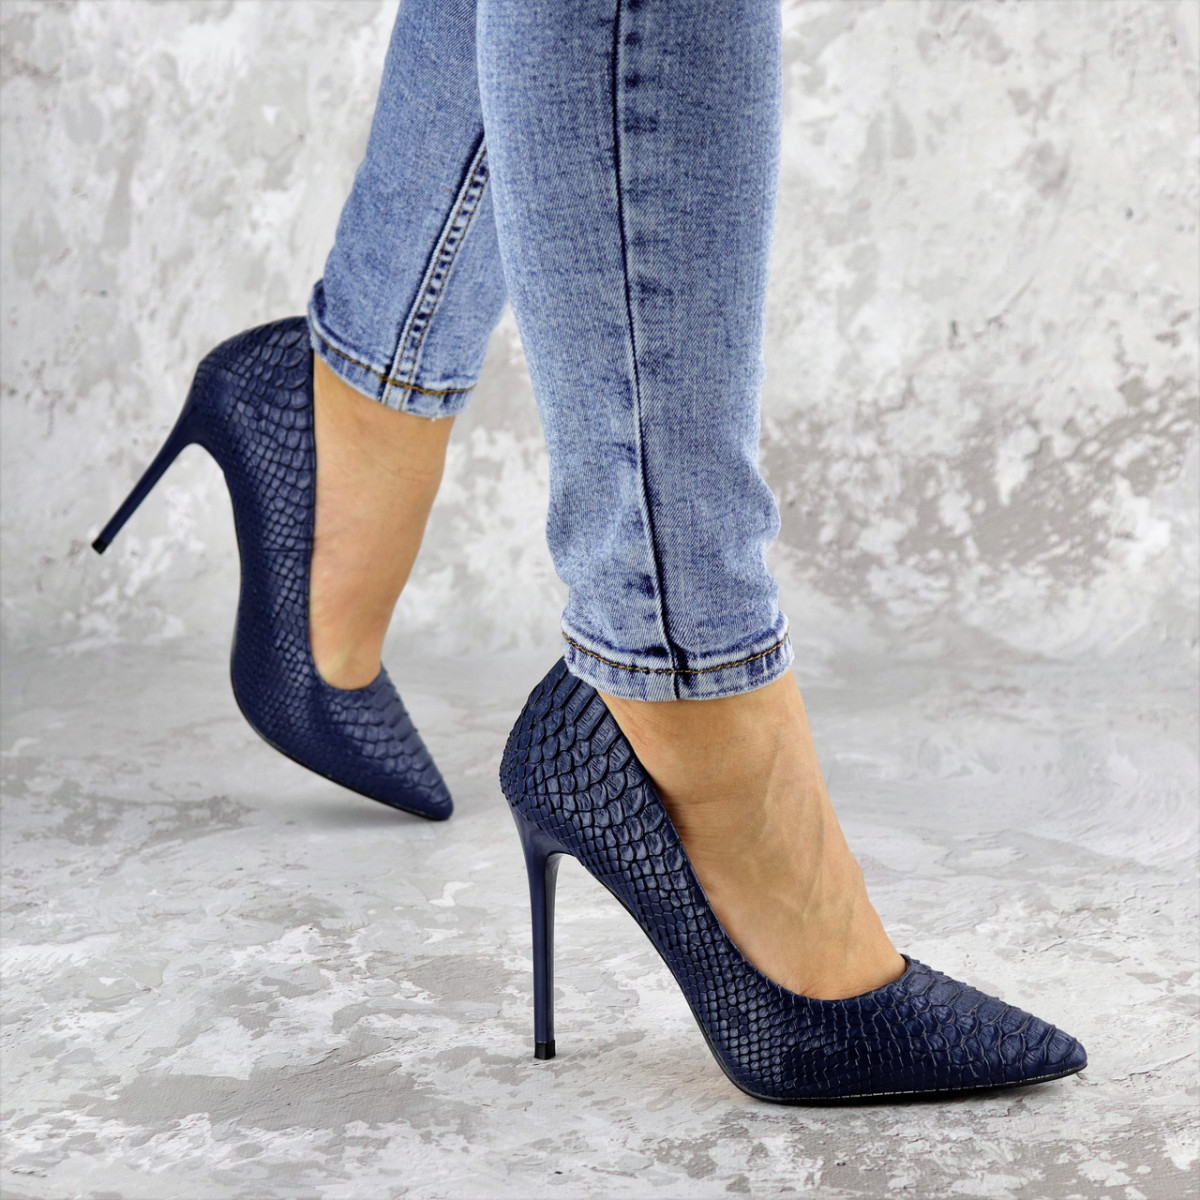 Туфли женские на каблуке Fashion Ollie 2145 36 размер 23,5 см Синий